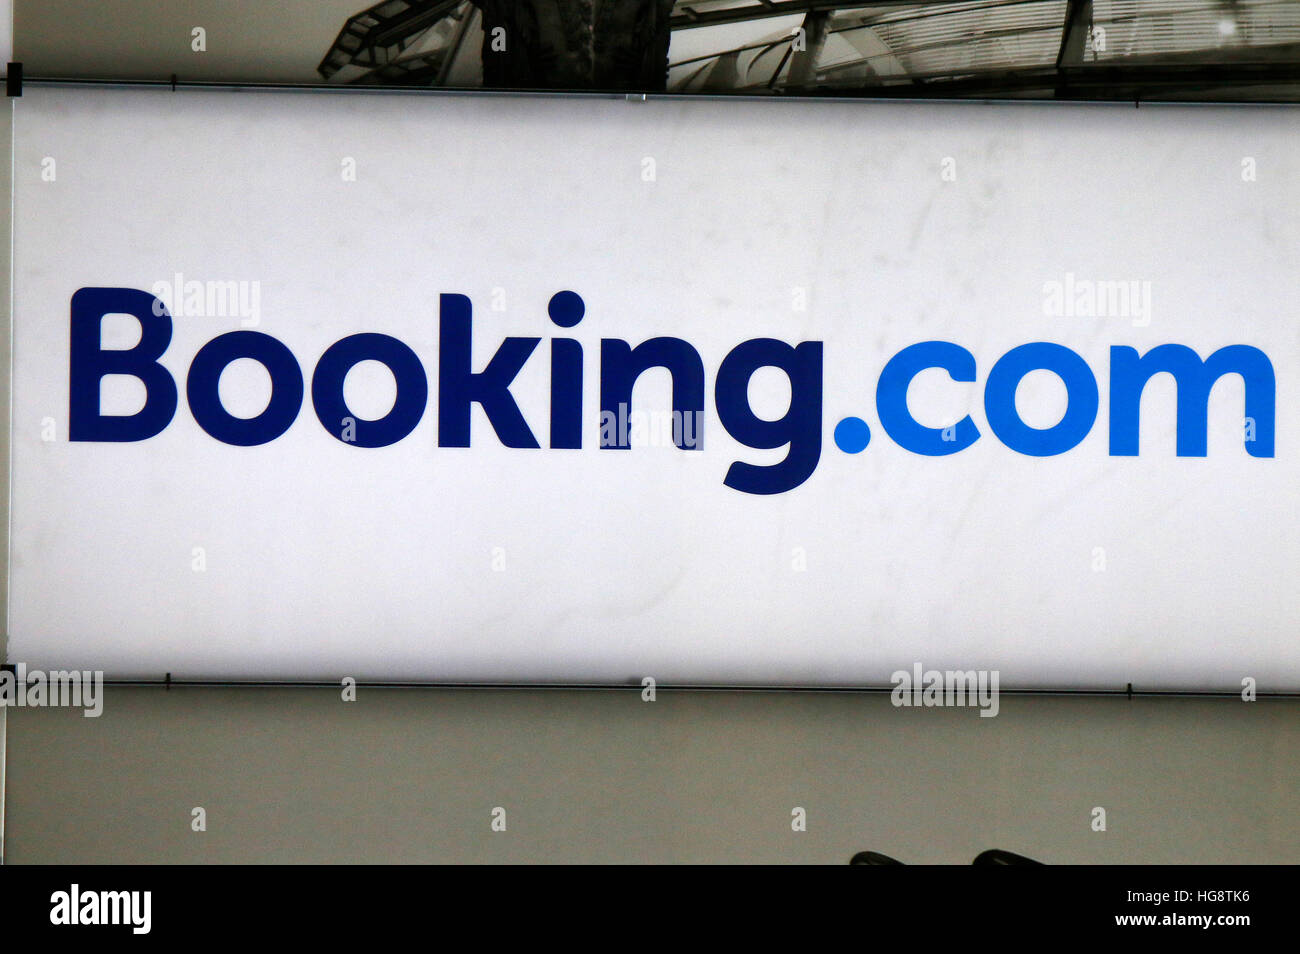 das Logo der Marke 'Booking.com', Berlin. - Stock Image